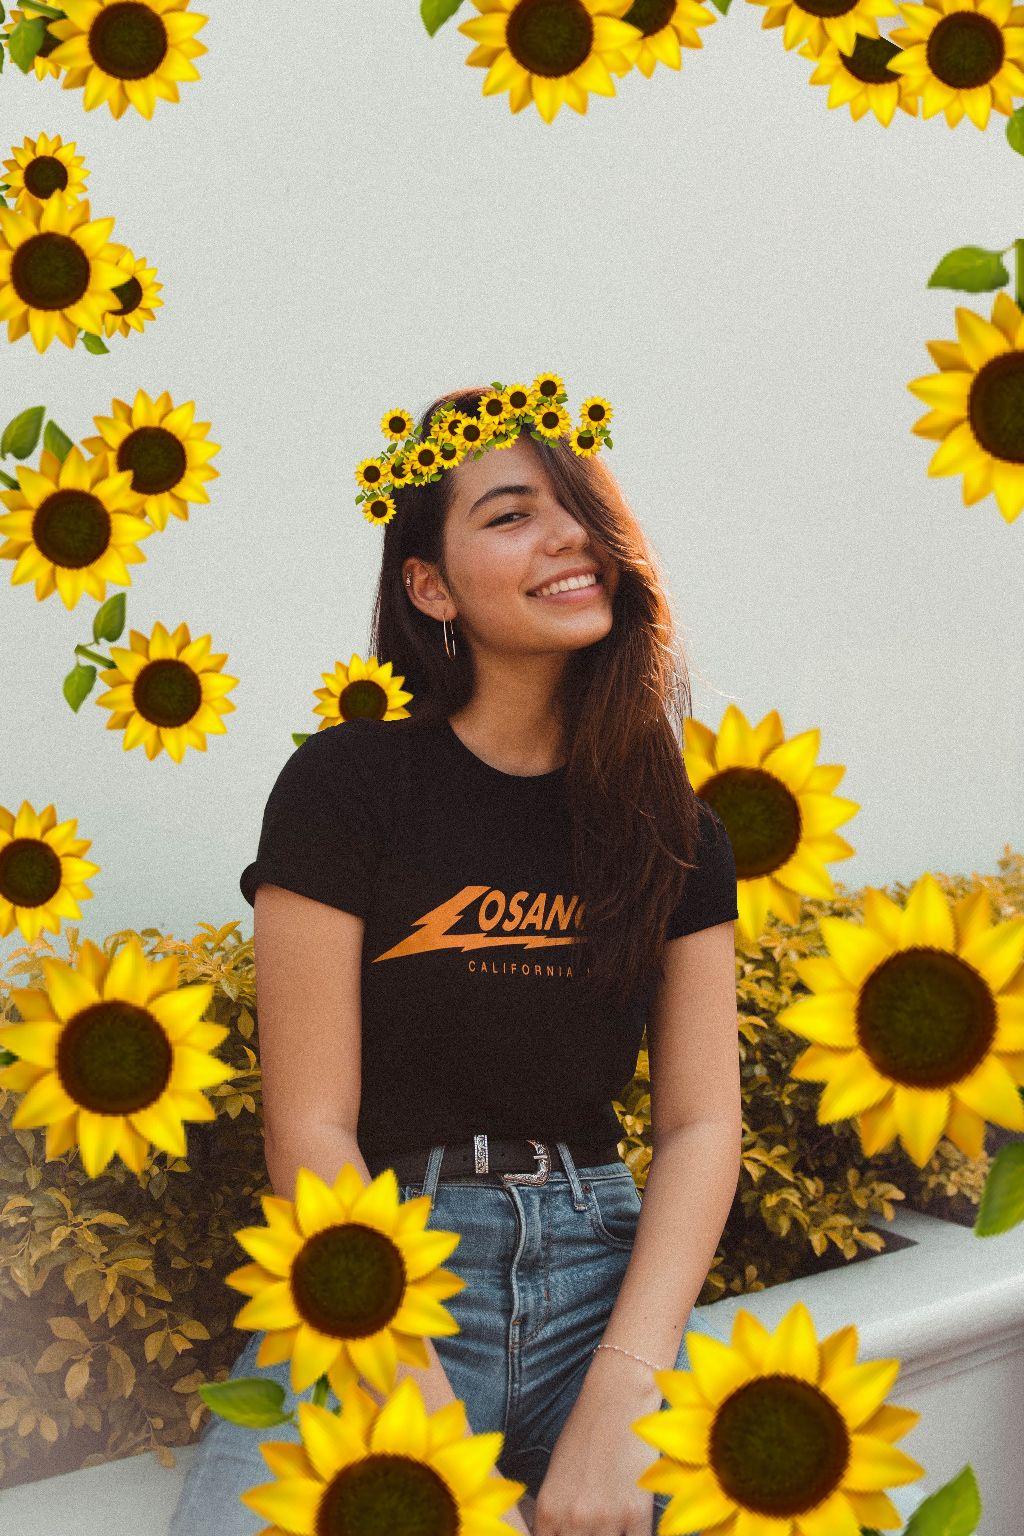 #freetoedit #summerdesign #summer #flower #love #girl #interesting